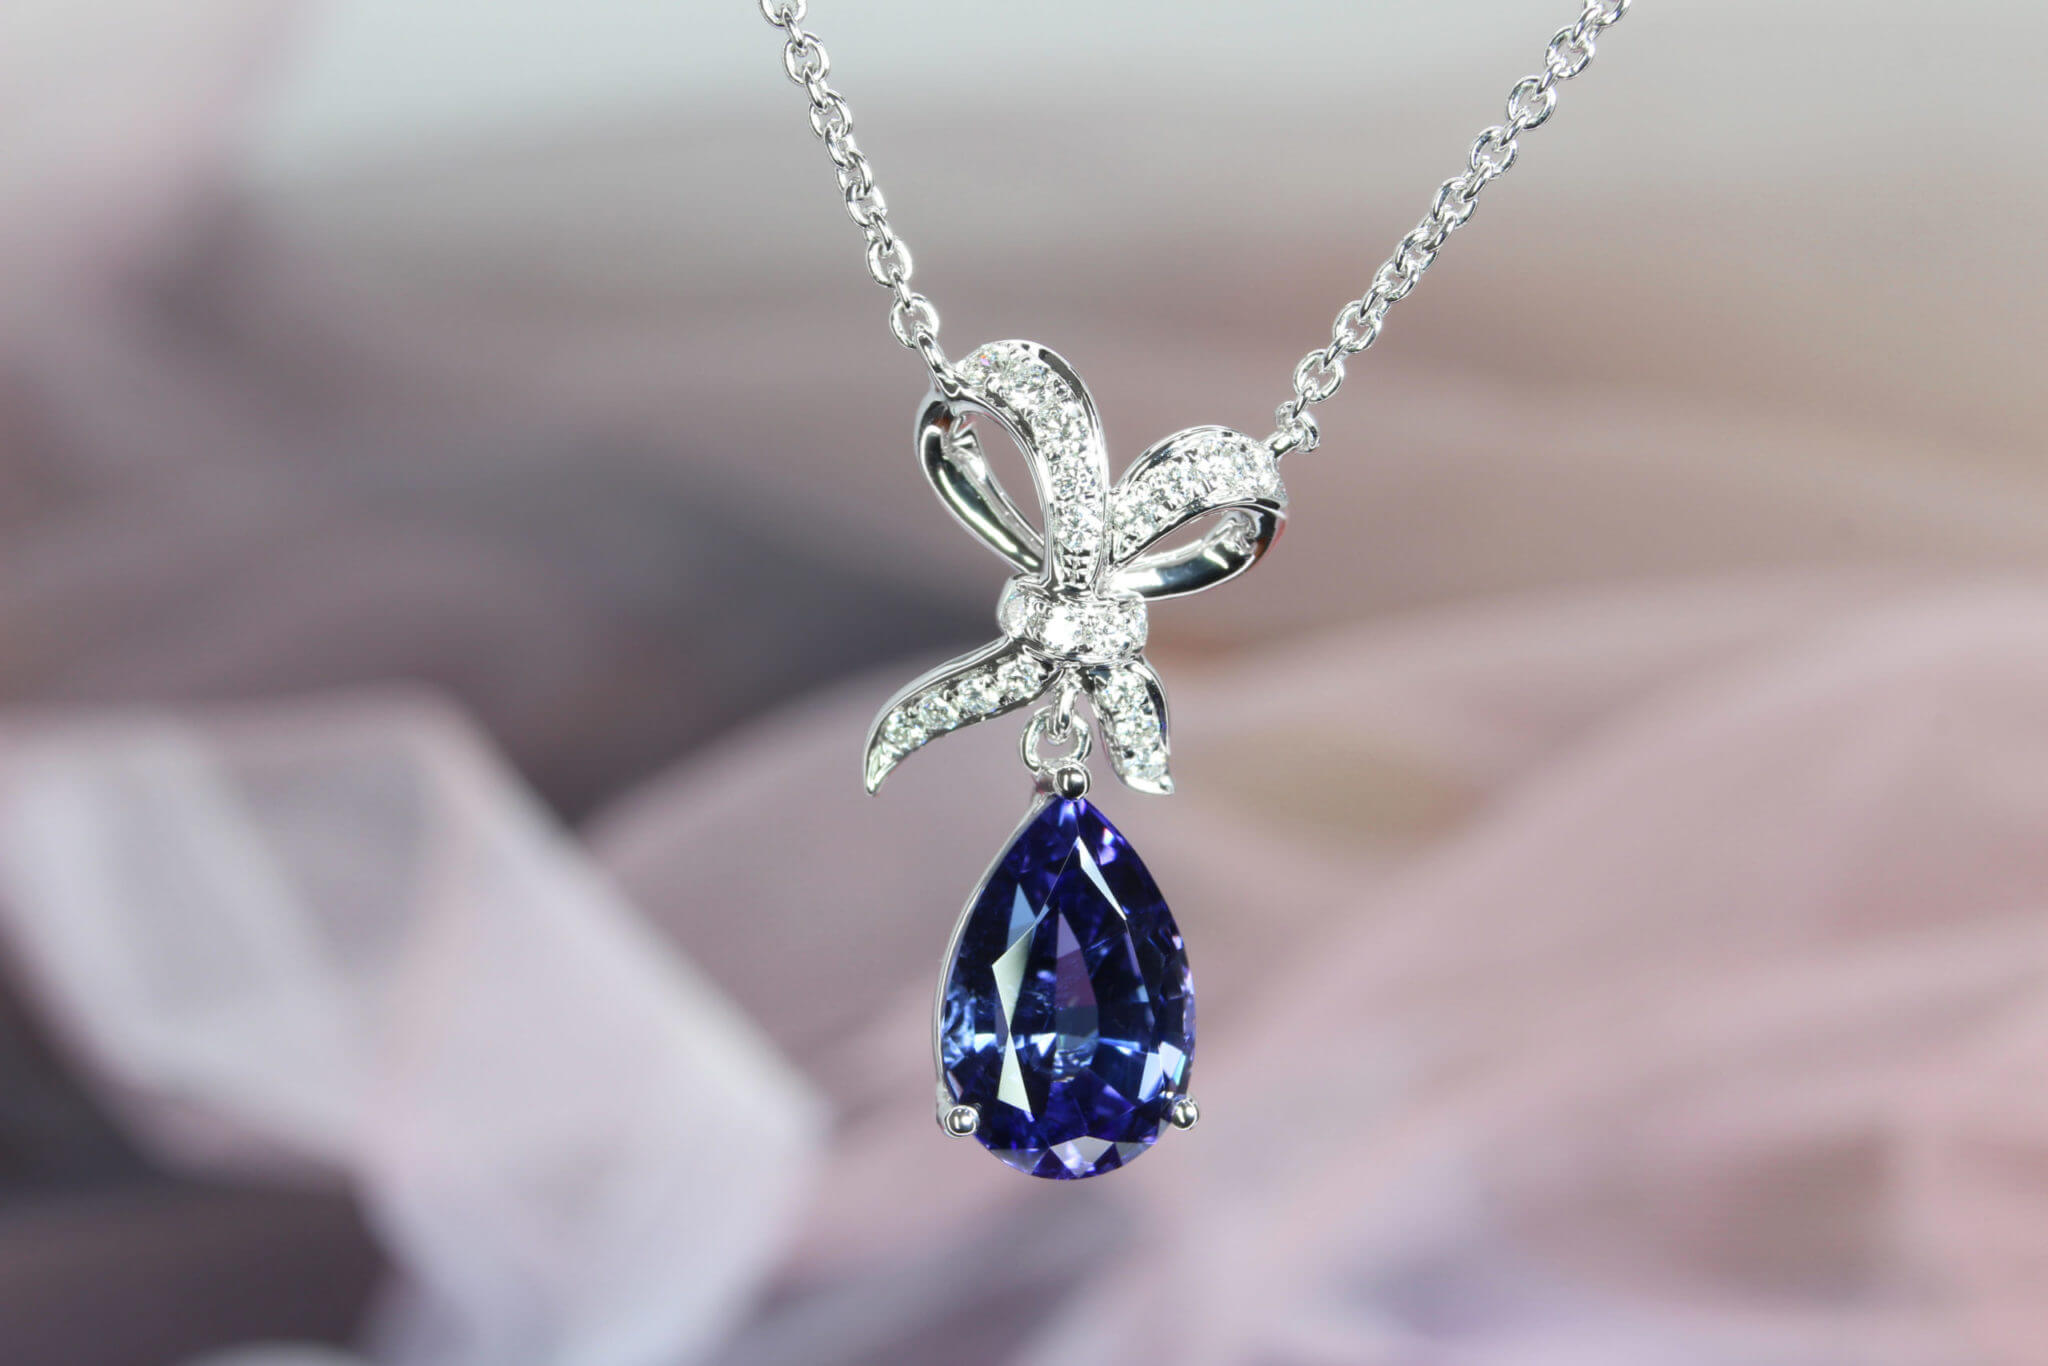 Tanzanite with Ribbon Diamond Pendant - Customised Jewellery